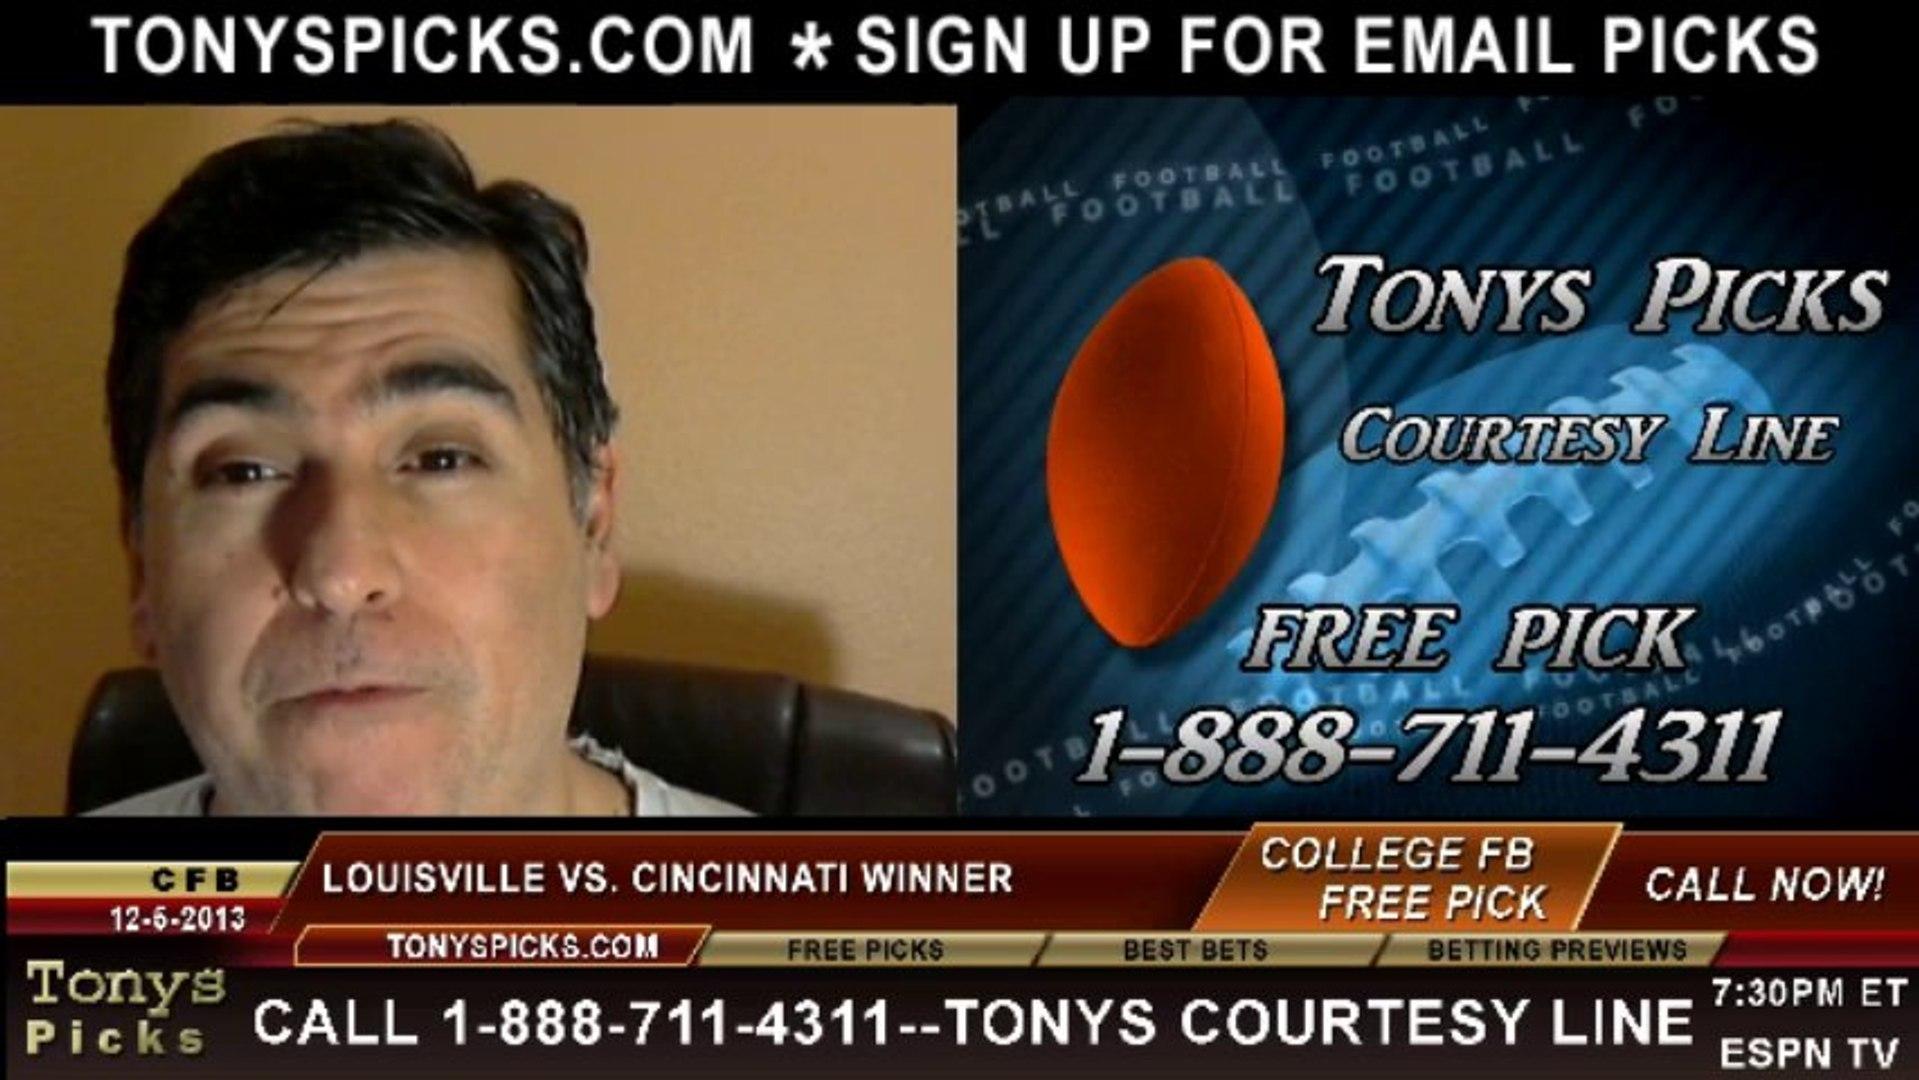 Louisville cincinnati betting preview cnbc money talks sports betting